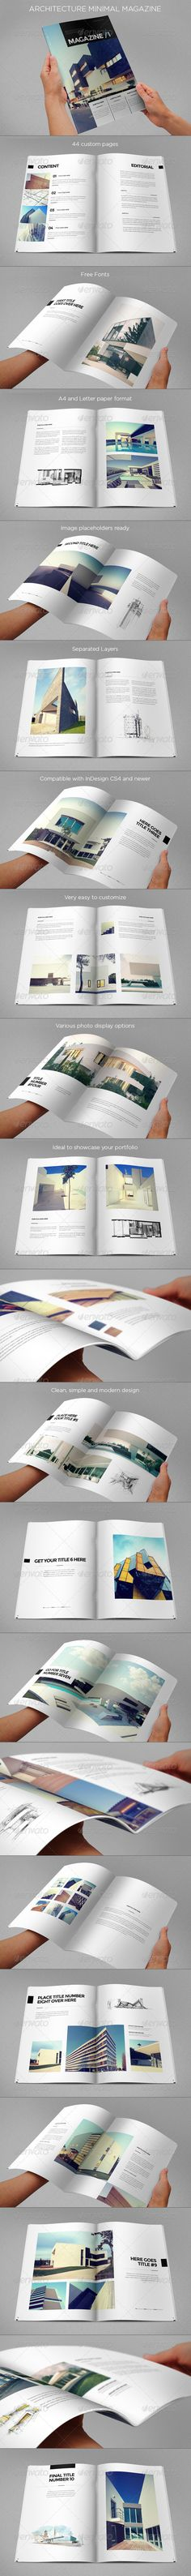 Architecture Minimal Magazine - Magazines Print Templates